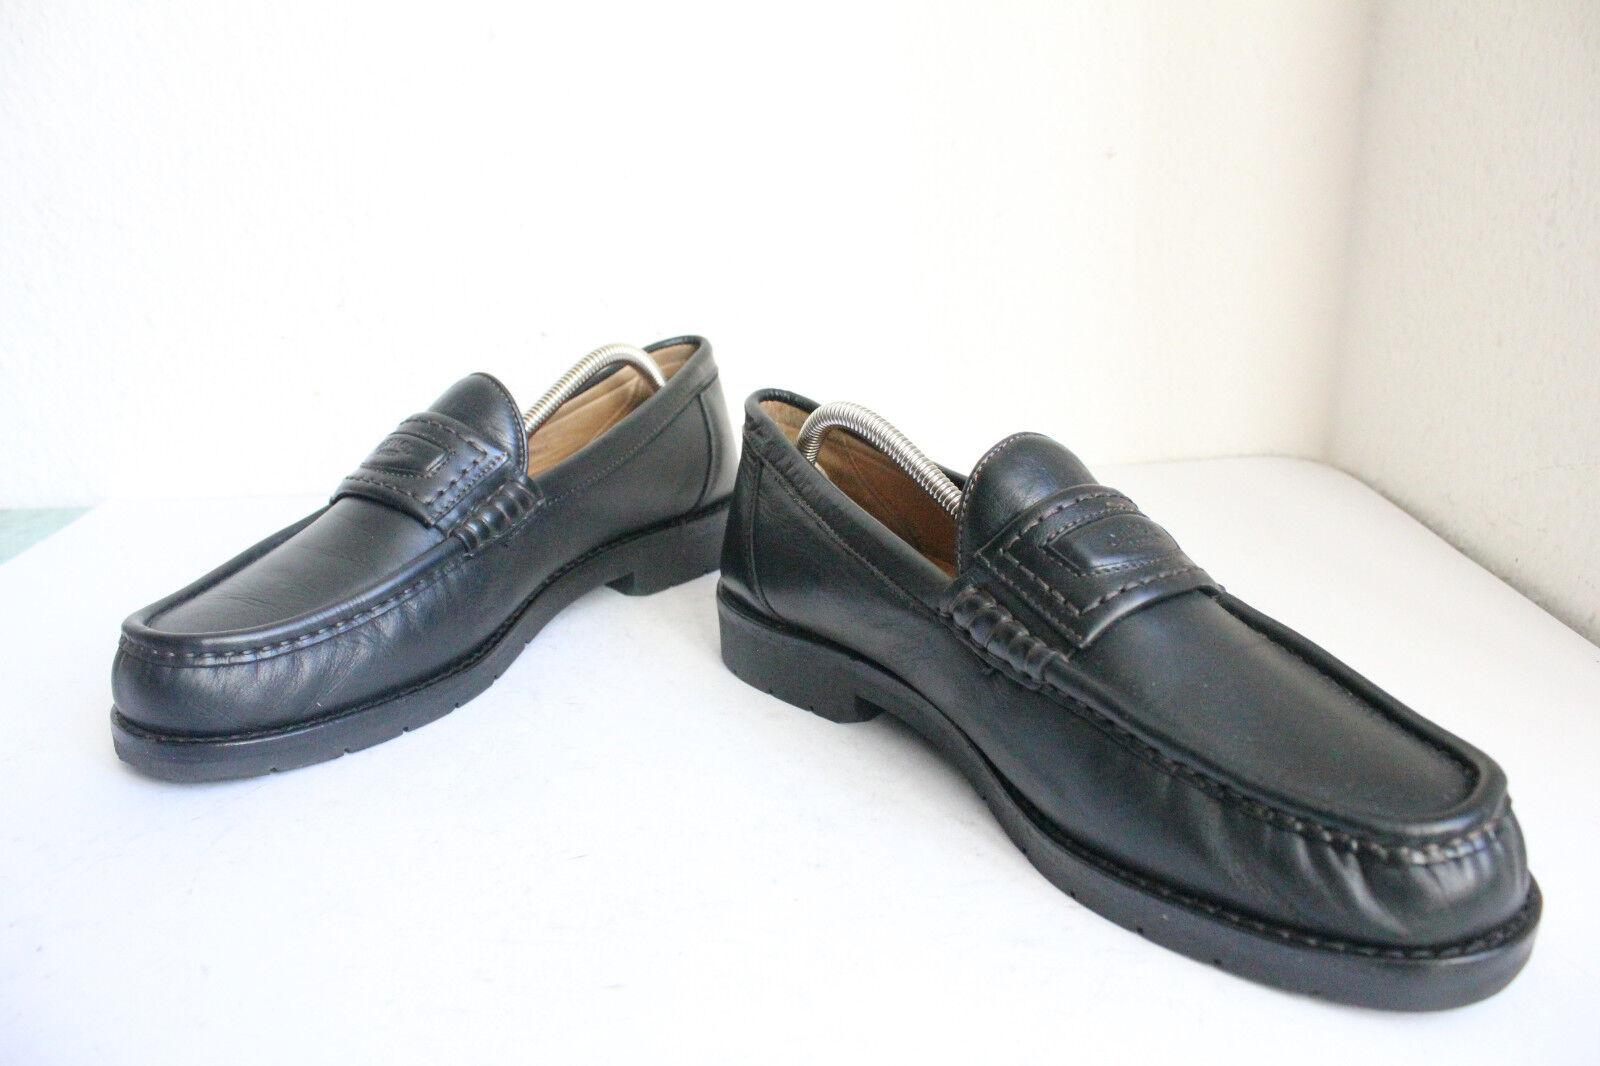 CAMEL Boots pelle Elegante Slipper Scarpe da uomo in vera pelle Boots nero eu:45, 5-uk:11 0ad831